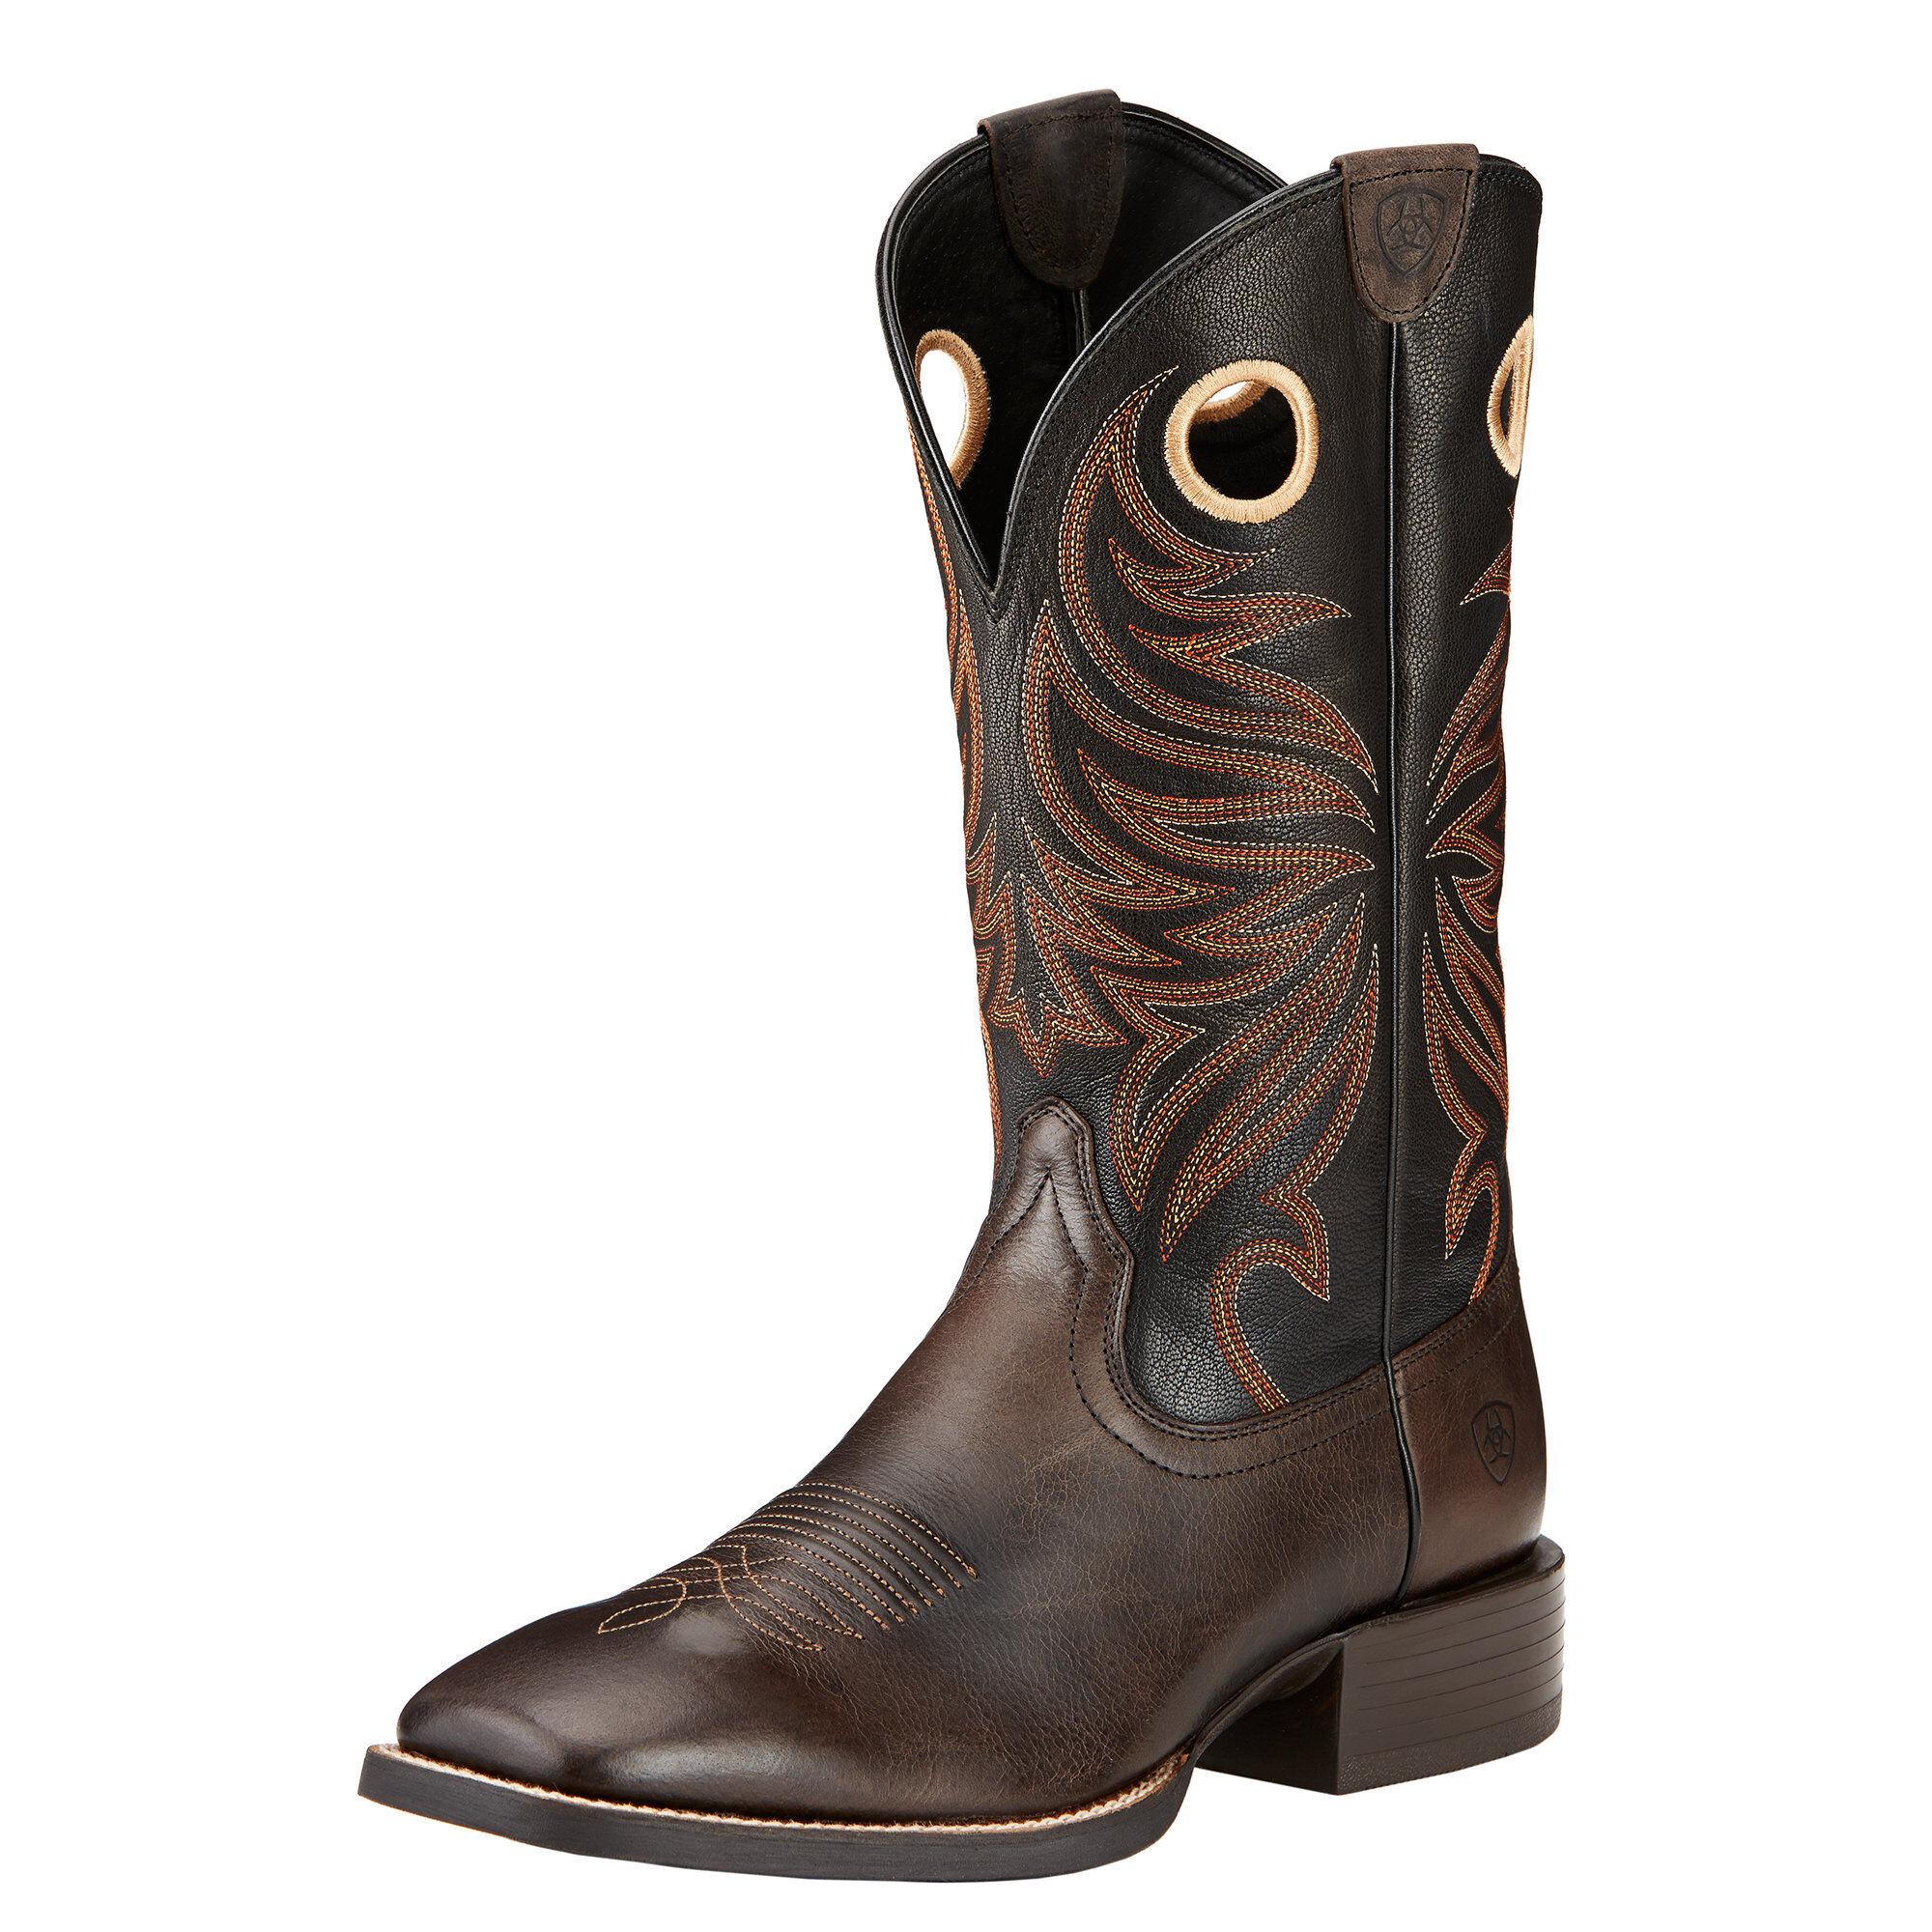 Ariat Boots Perth